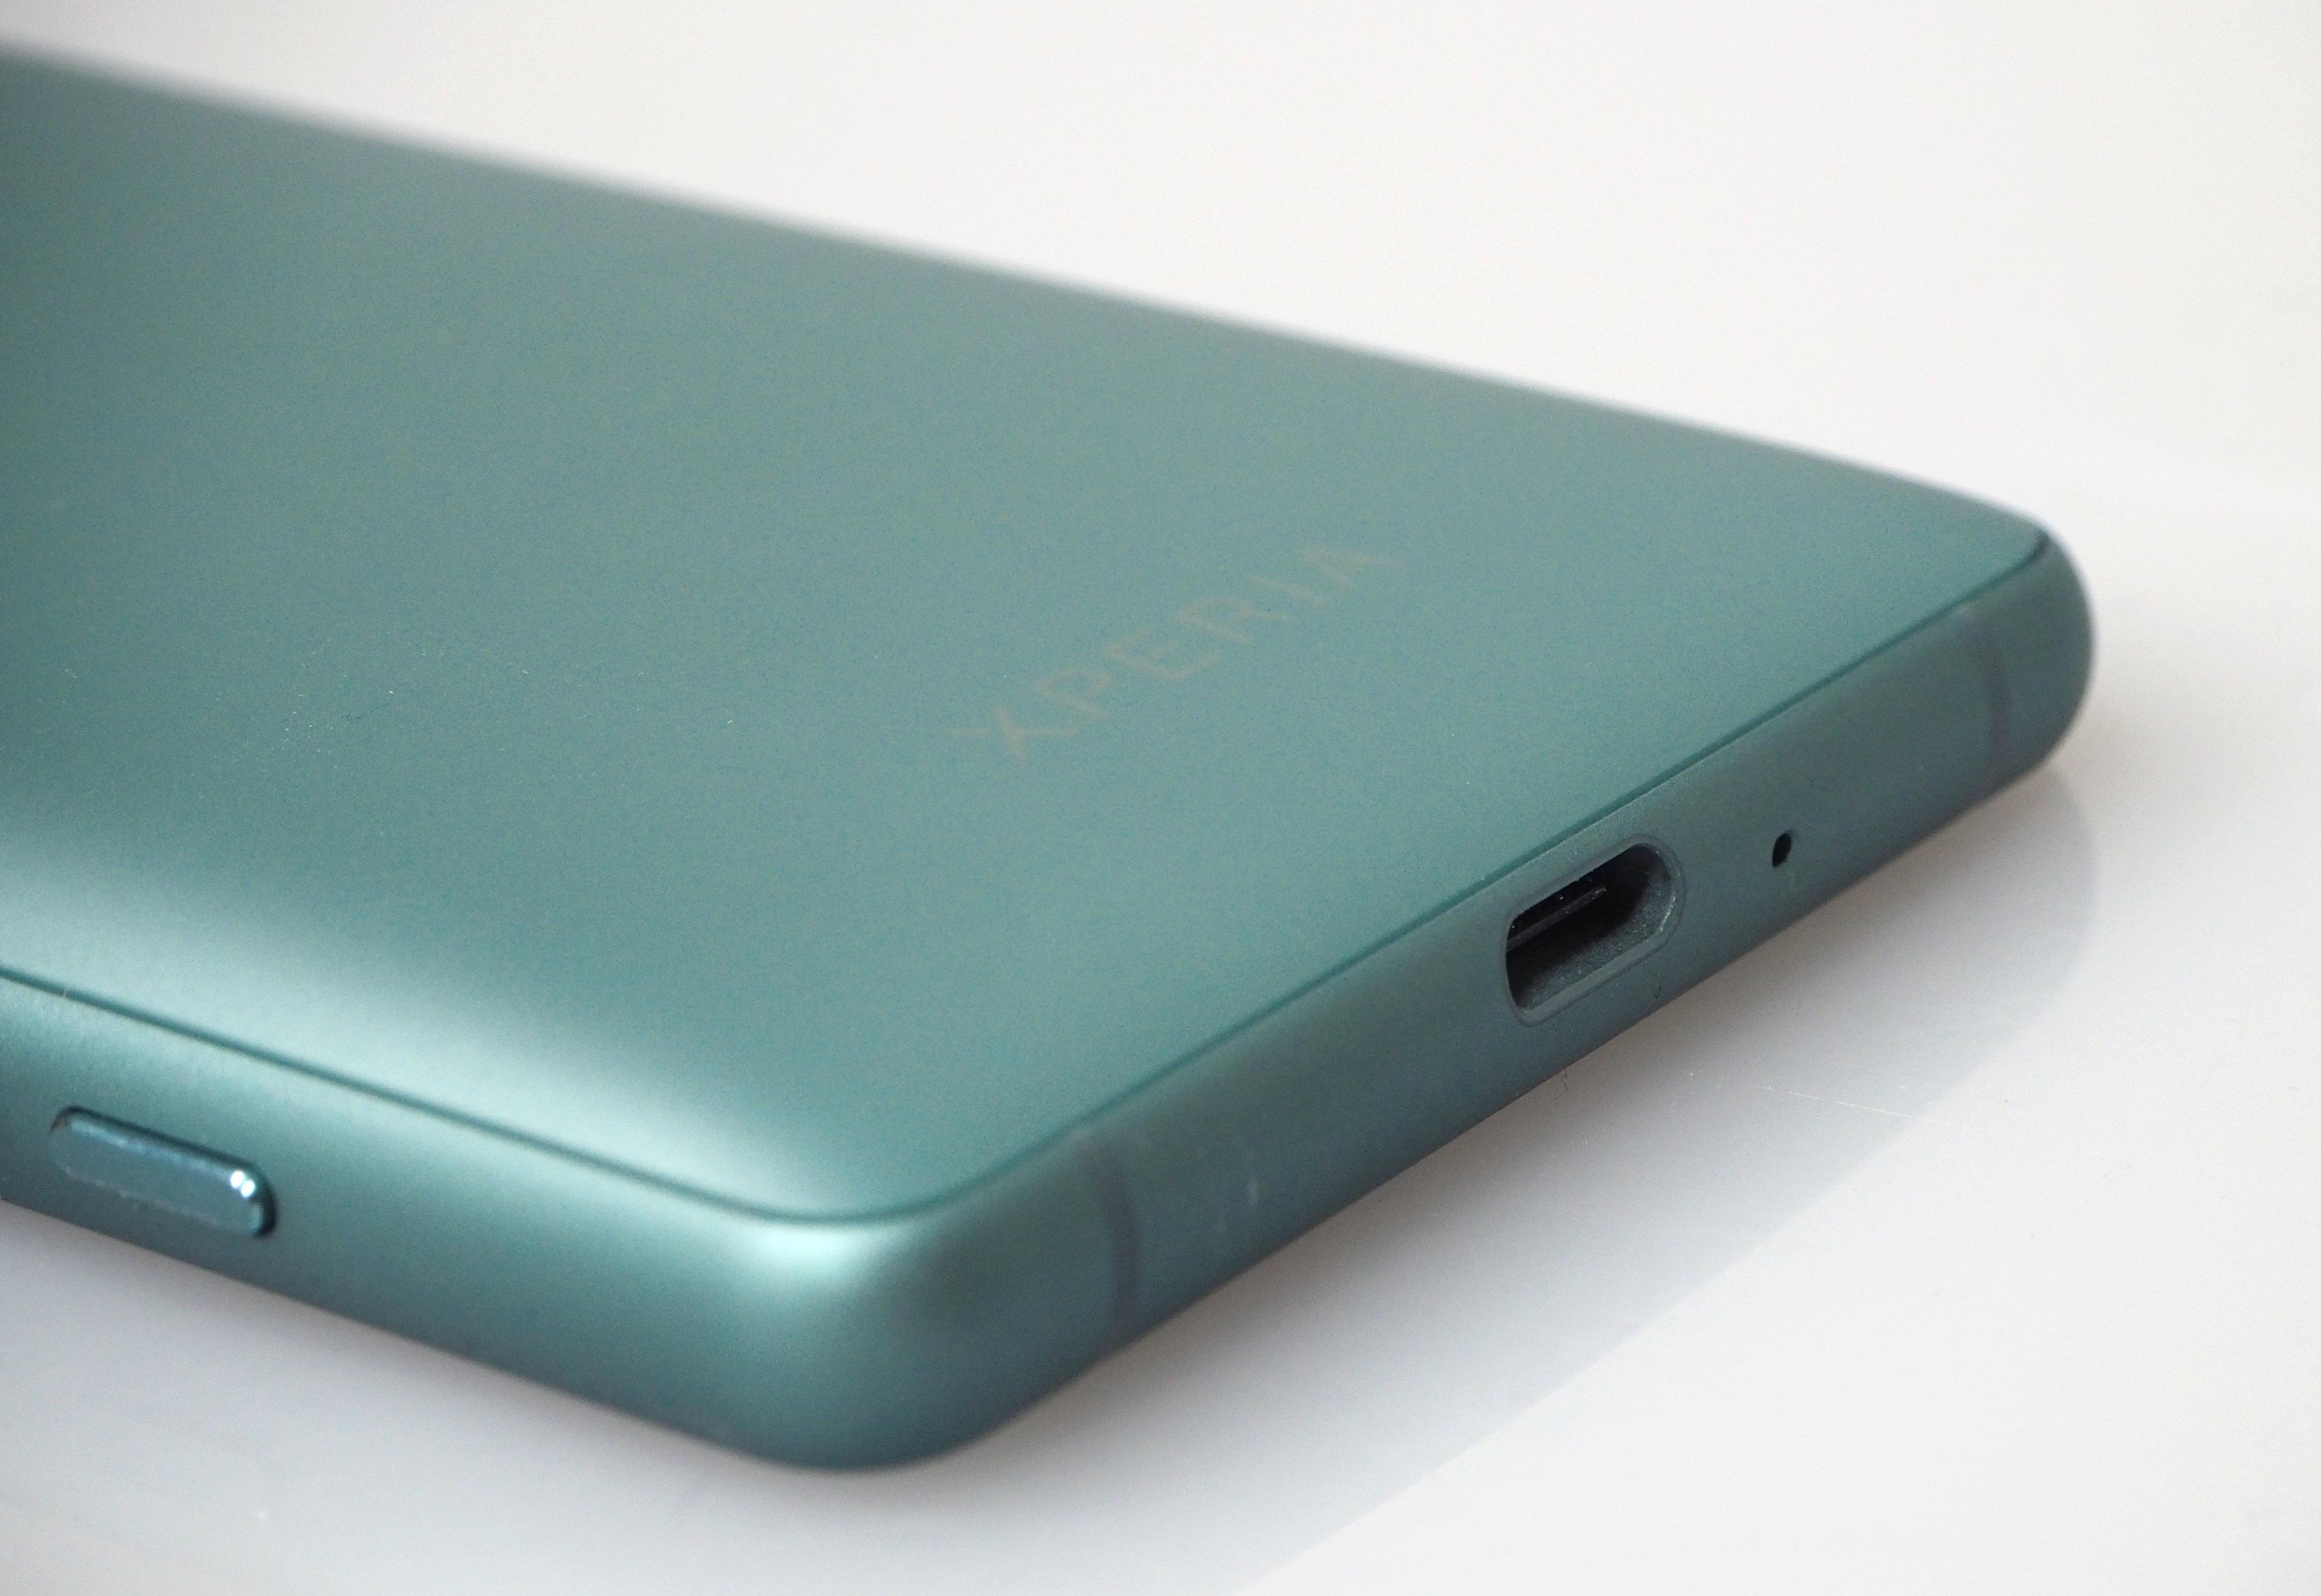 Sony Xperia XZ2 Compact Review | ePHOTOzine